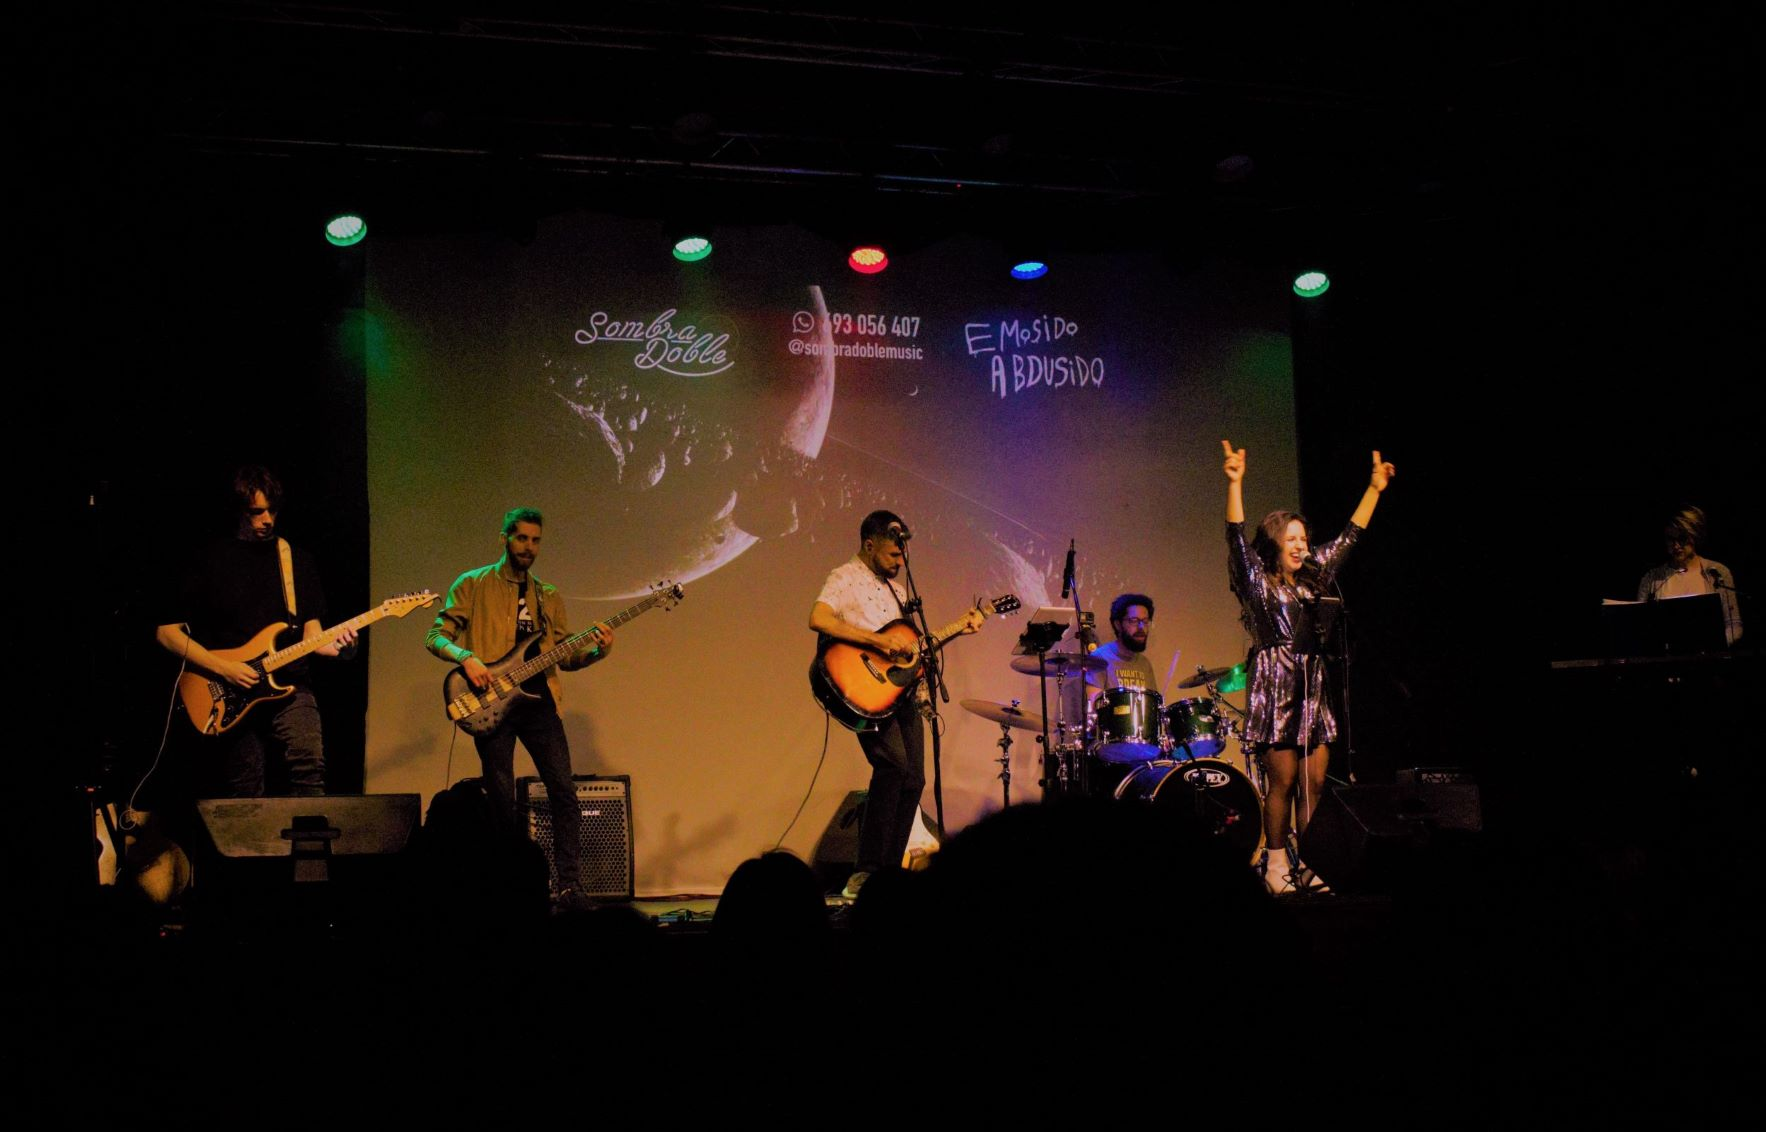 Sombra Doble tributo al indie español (Izal, Vetusta Morla, Pereza, Leiva...)